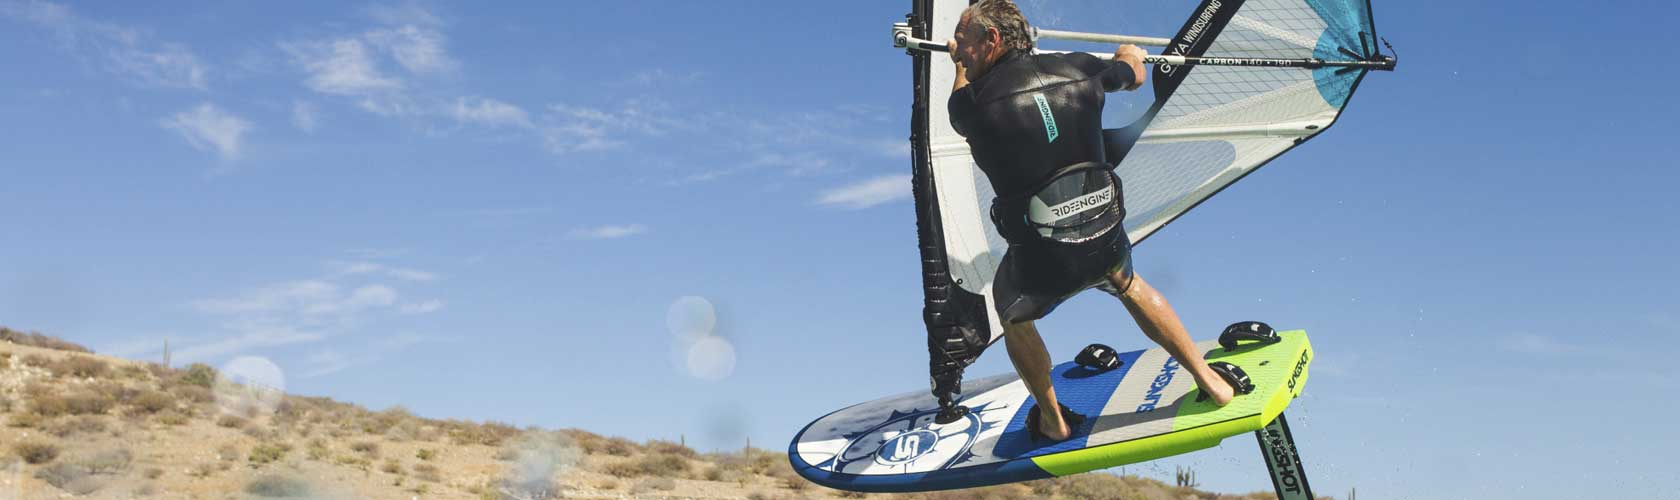 home3-windsurf